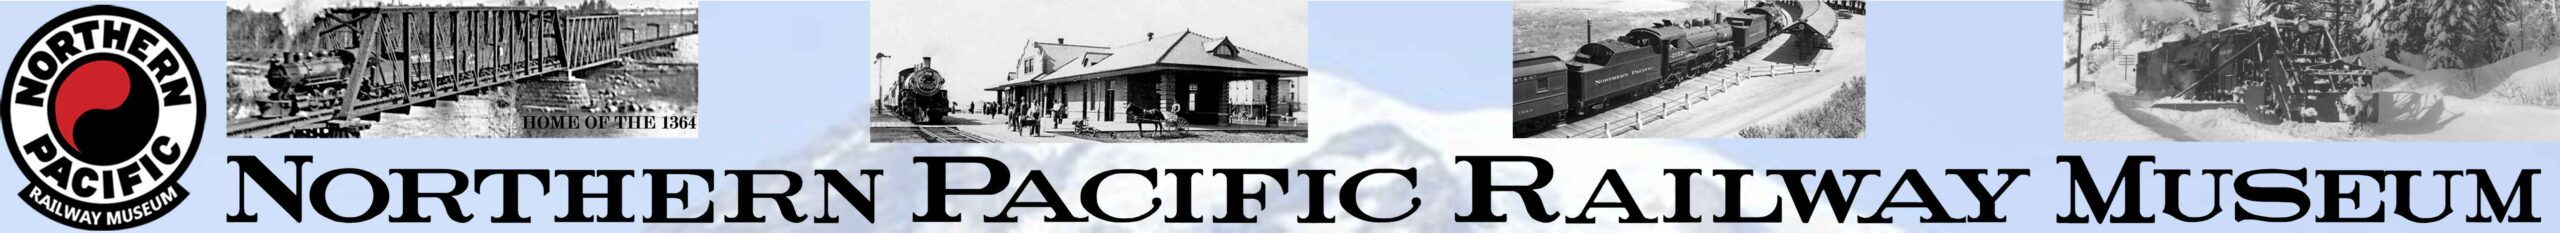 Northern Pacific Railway Museum Logo